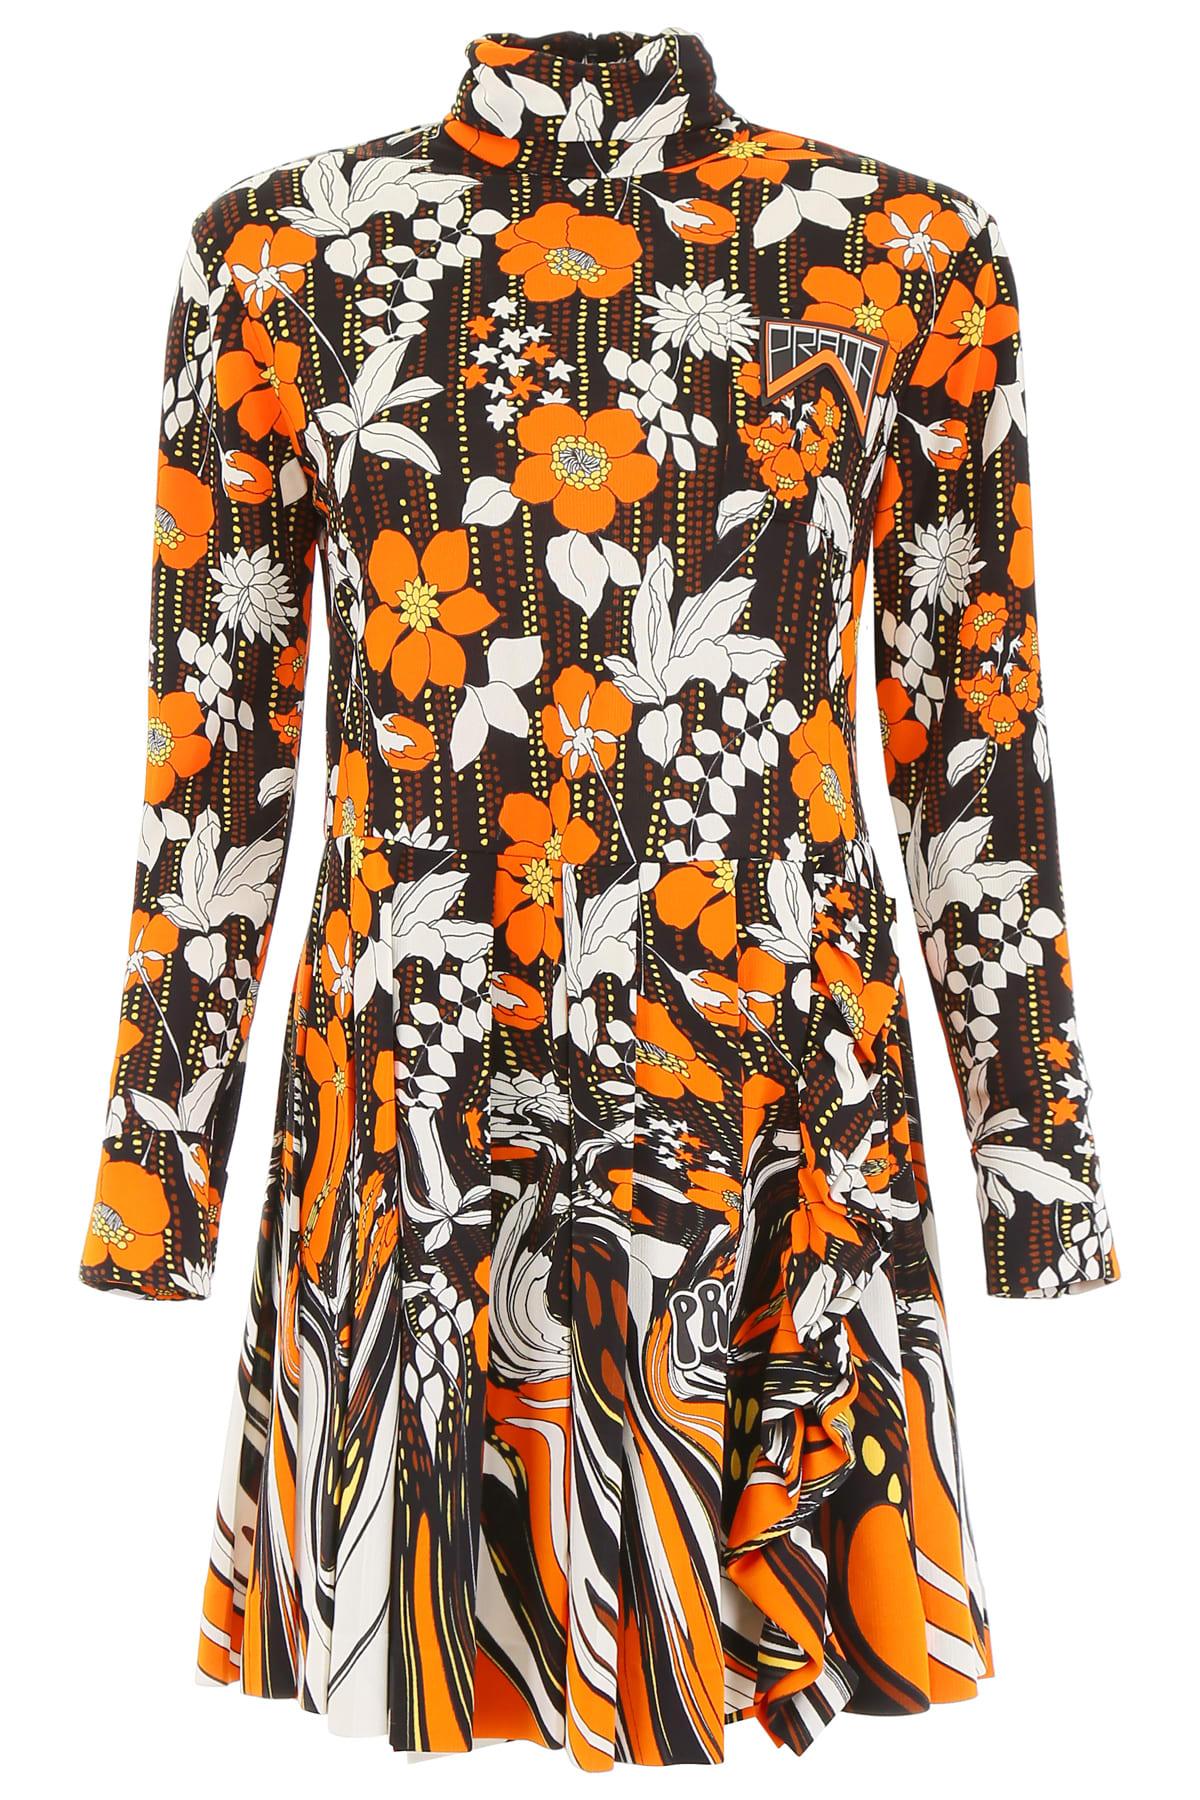 Photo of  Prada Floral Printed Dress- shop Prada  online sales